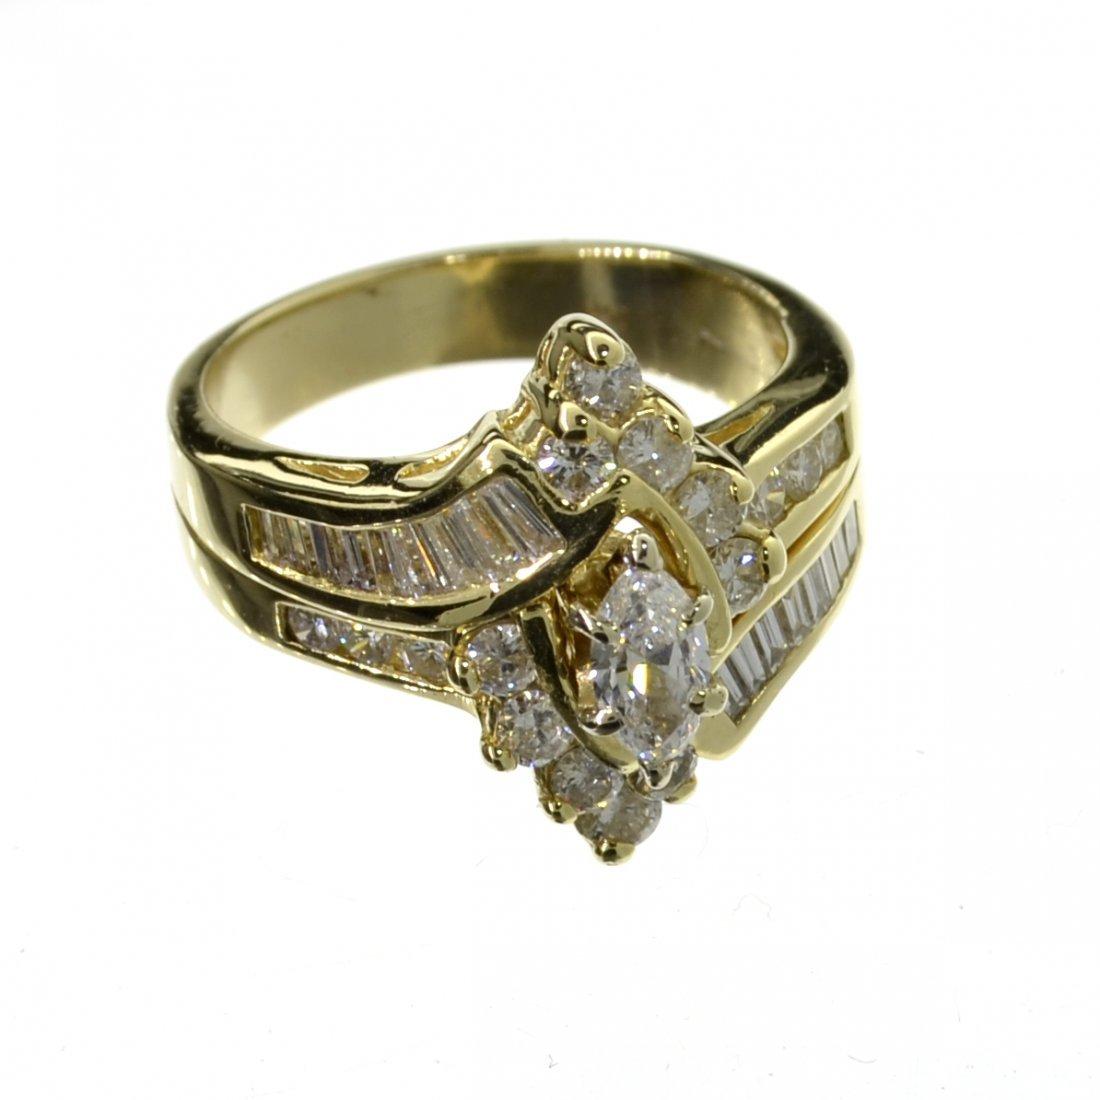 APP: 10.6k 14 kt. Gold, 1.71CT Mixed Cut Diamond Ring